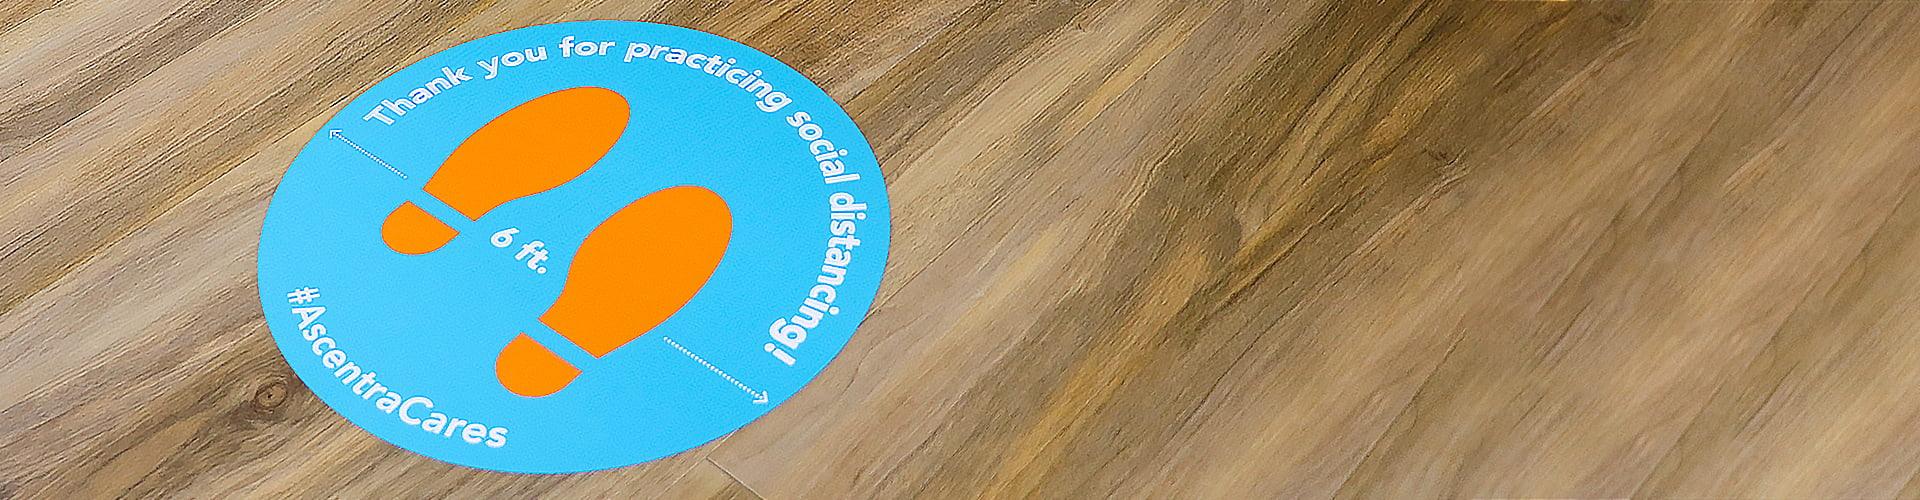 Blue circle on hard wood floor with orange foot prints